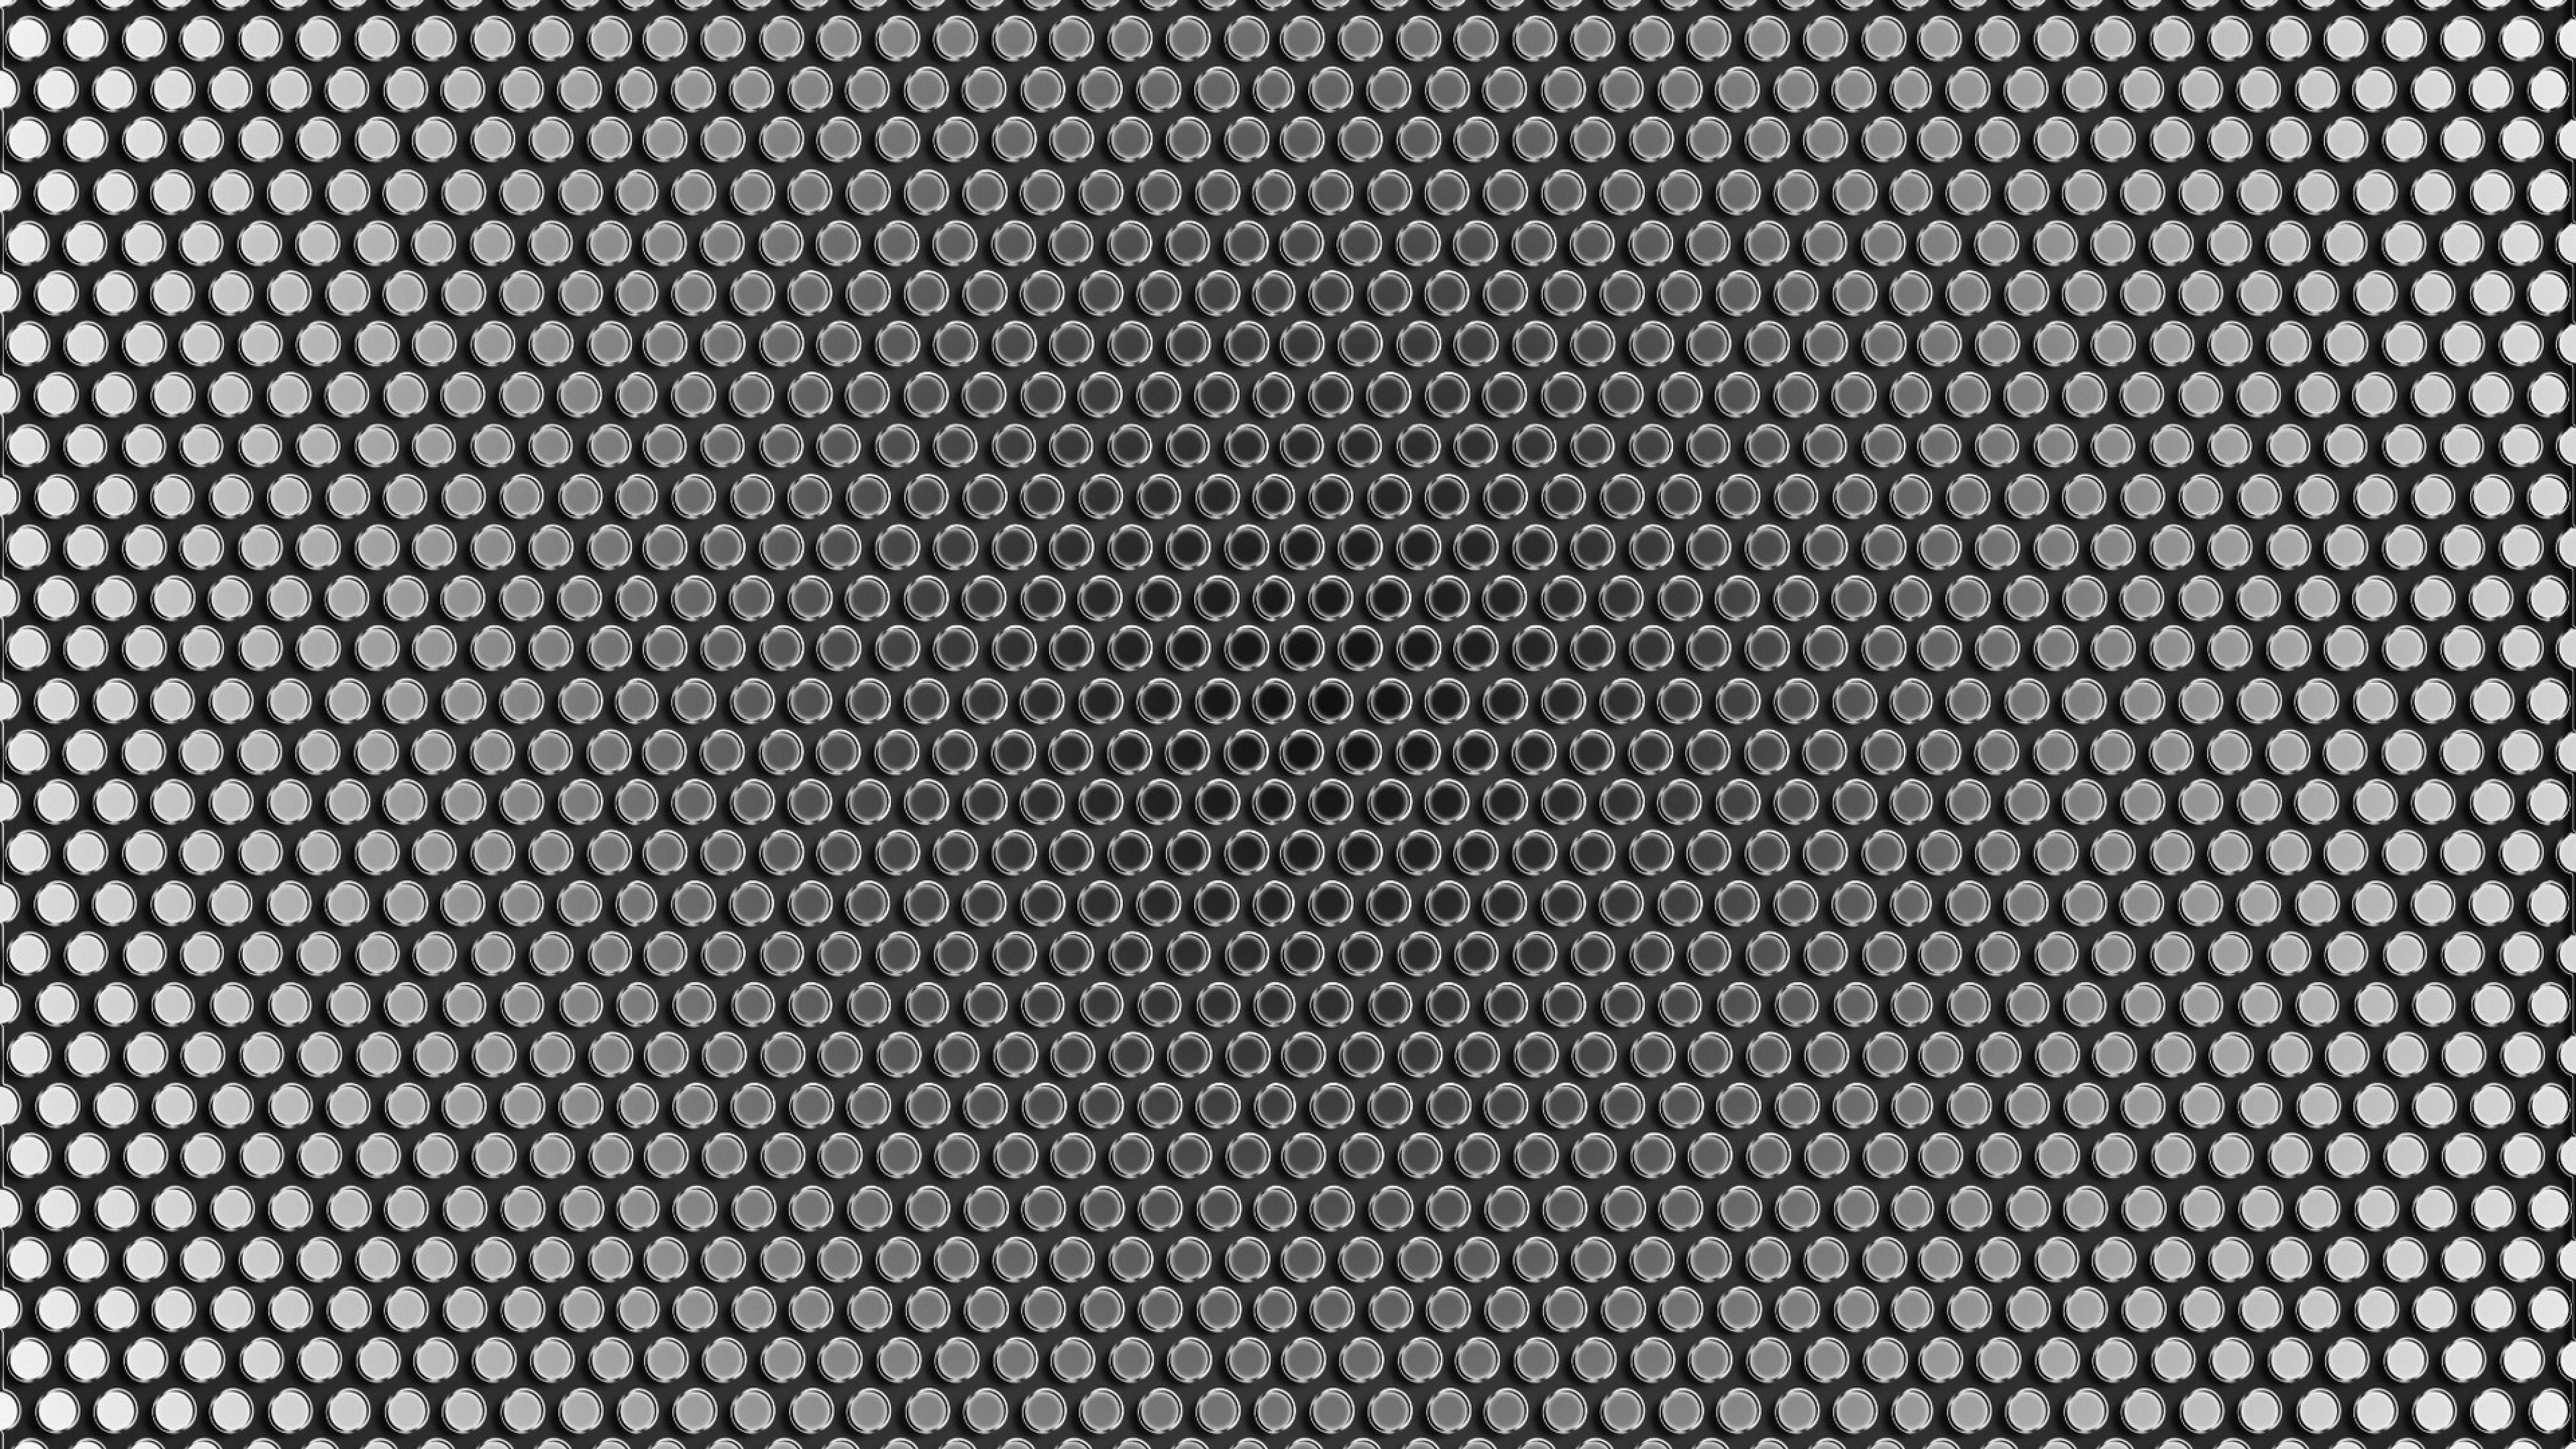 4K Texture Wallpaper